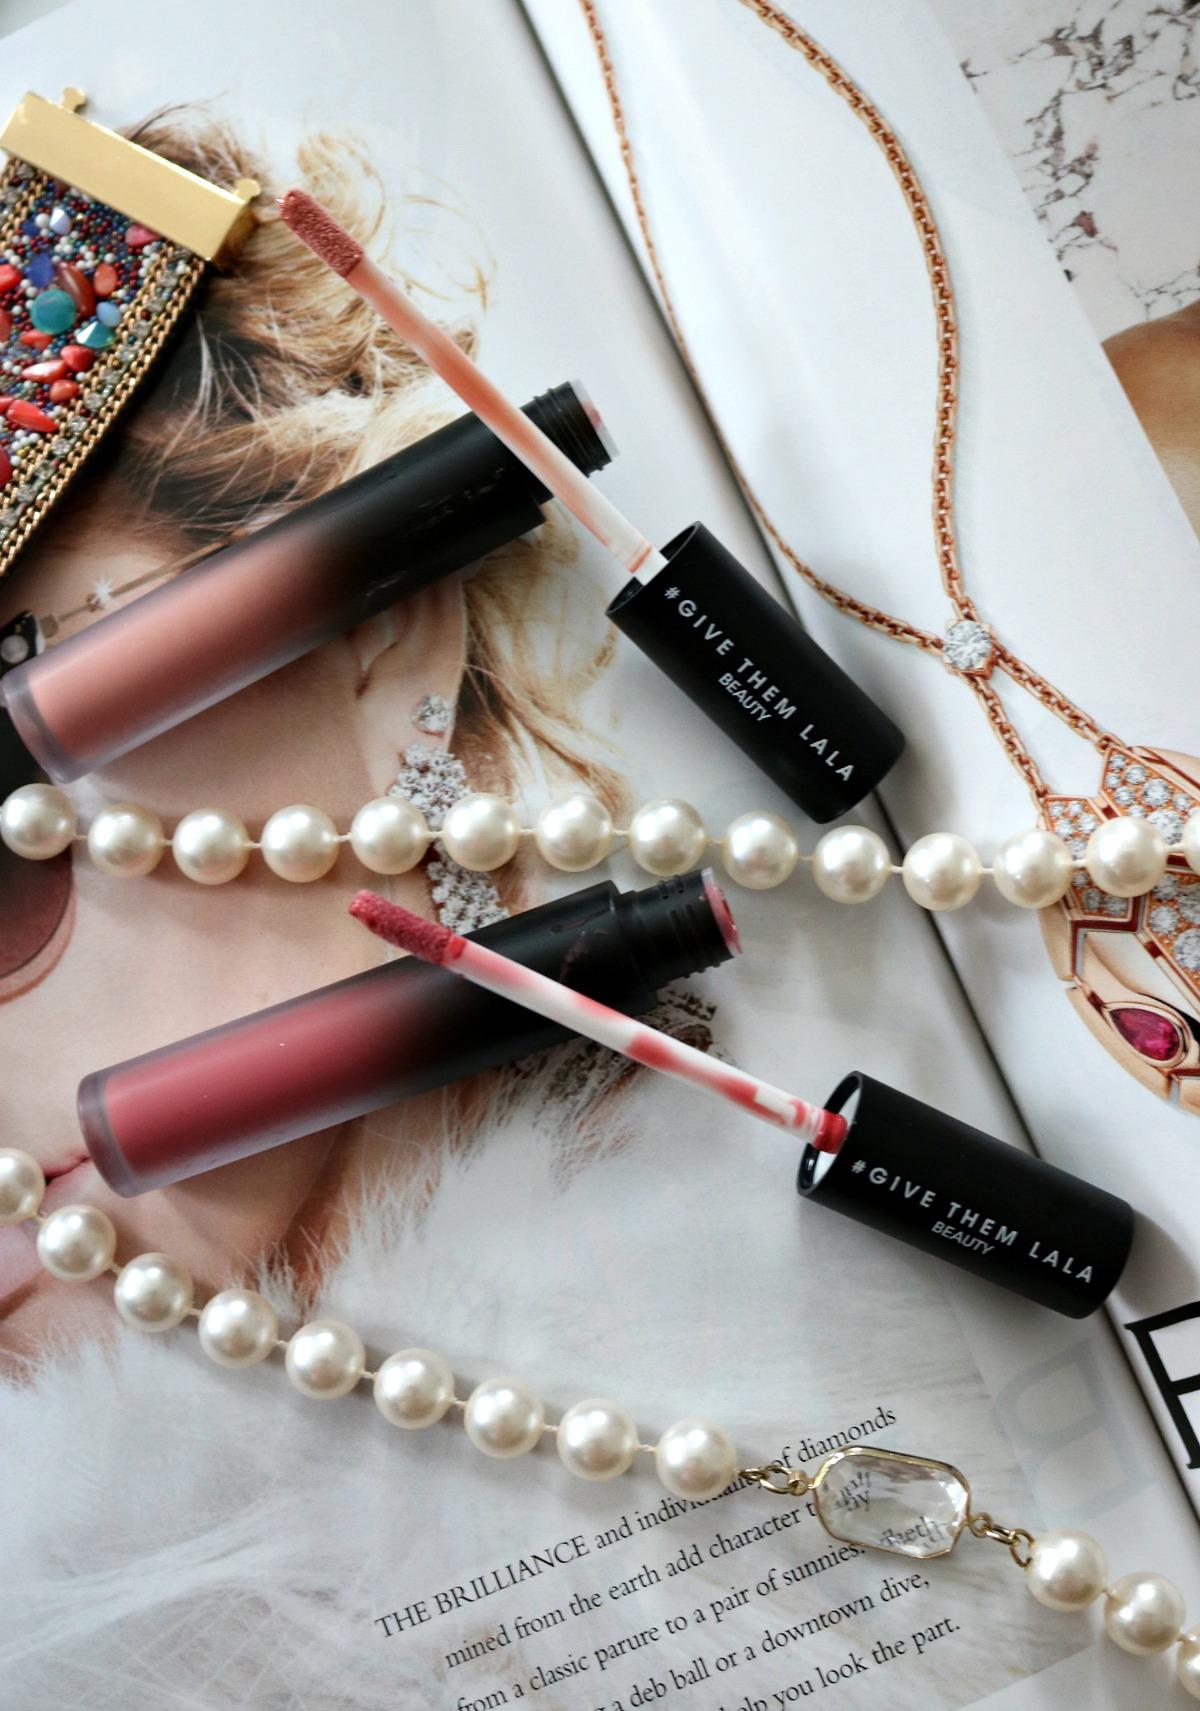 Most Popular Blog Posts of 2018 I Give Them Lala Beauty Lip Gloss Review I DreaminLace.com #CrueltyFree #LipGloss #CrueltyFreeBeauty